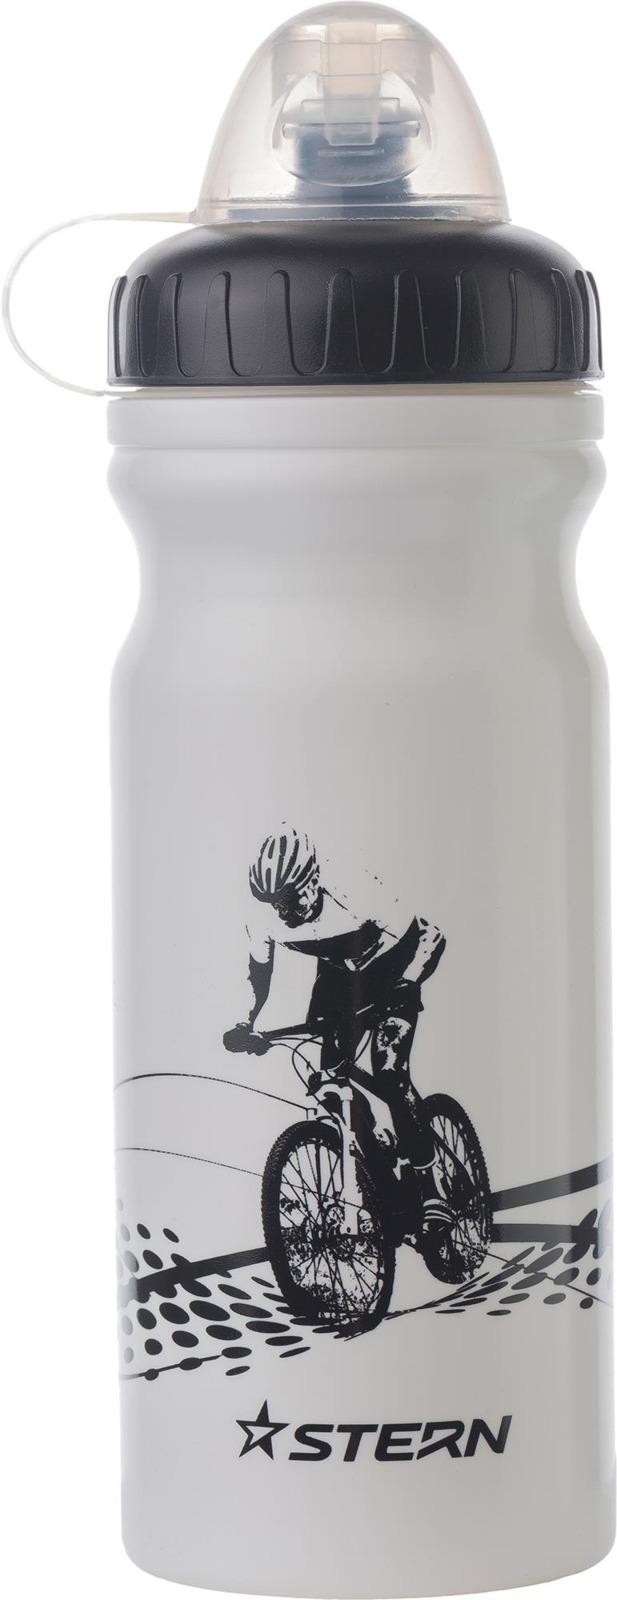 Фляга велосипедная Stern 01 CBOT-1 Water bottle, белый